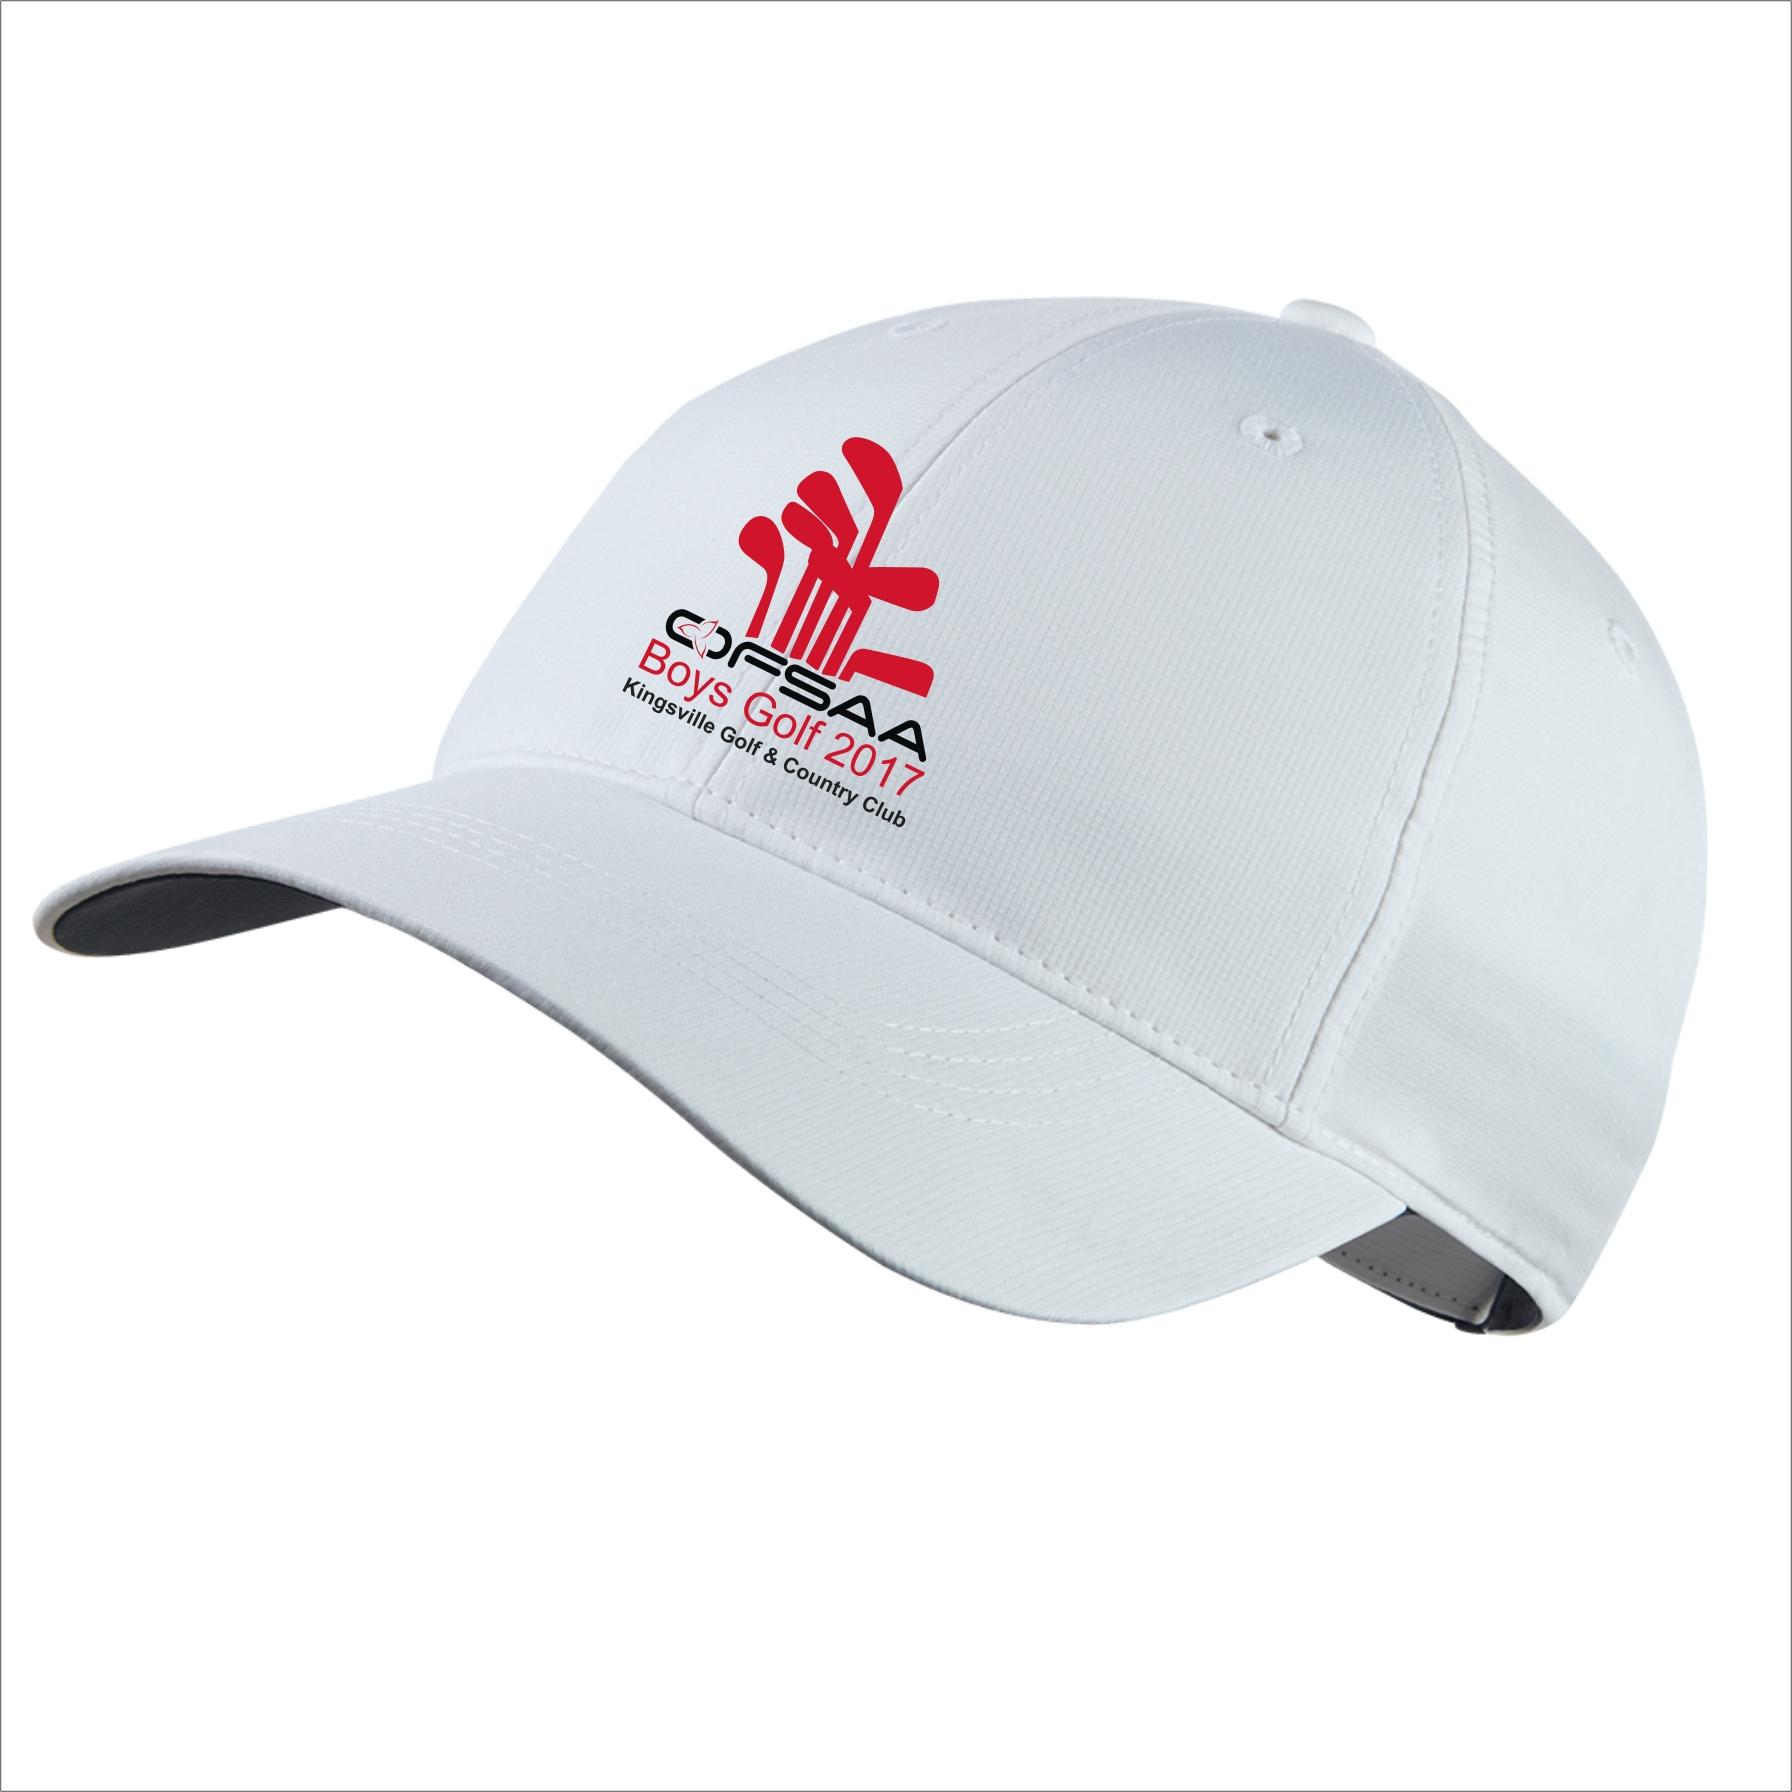 2017 Boys Golf hat single.jpg